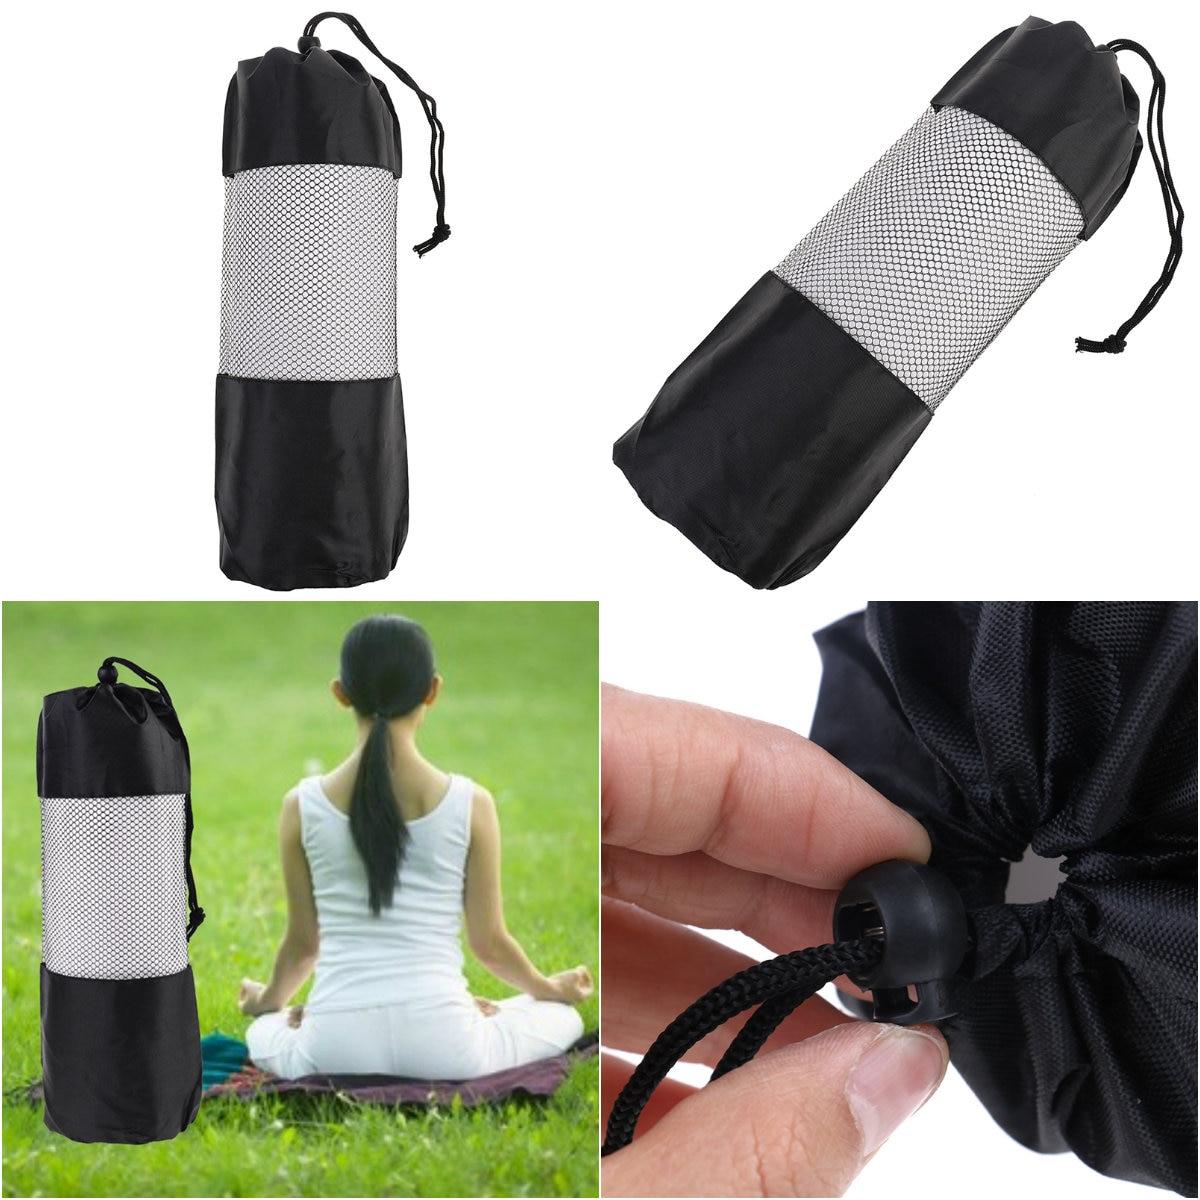 Ropa, Calzado Y Complementos 35*10.5cm Yoga Bag Canvas Practical Yoga Pilates Sport Exercise Mat Carry Strap Drawstring Bag Gym Bag Fitness Backpack